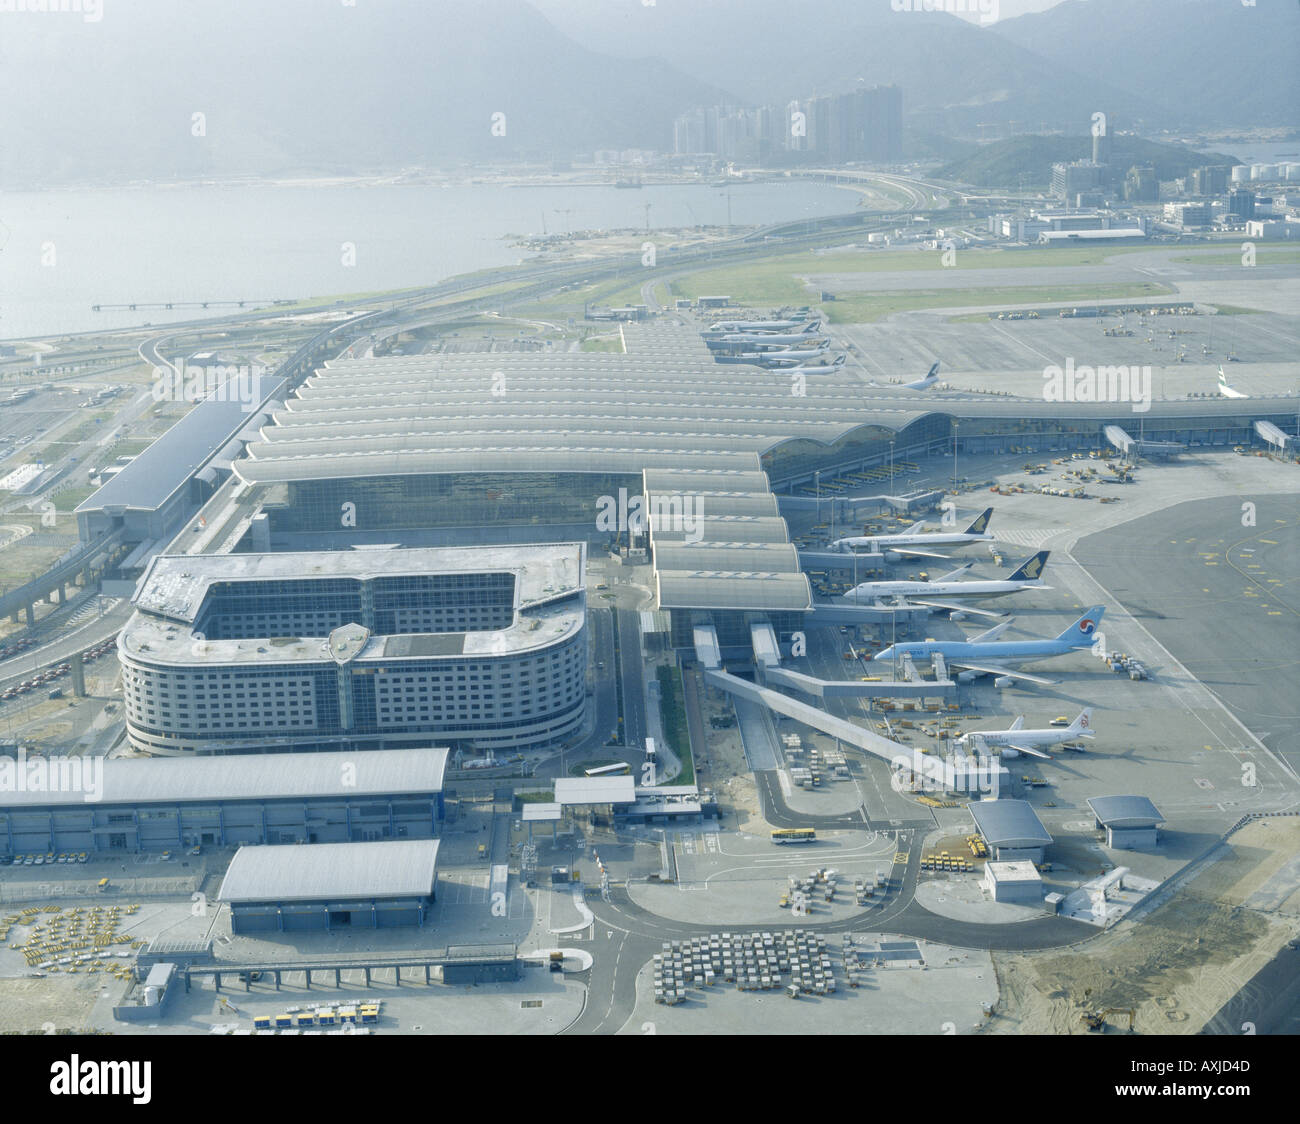 CHEK LAP KOK HONG KONG INTERNATIONAL AIRPORT - Stock Image